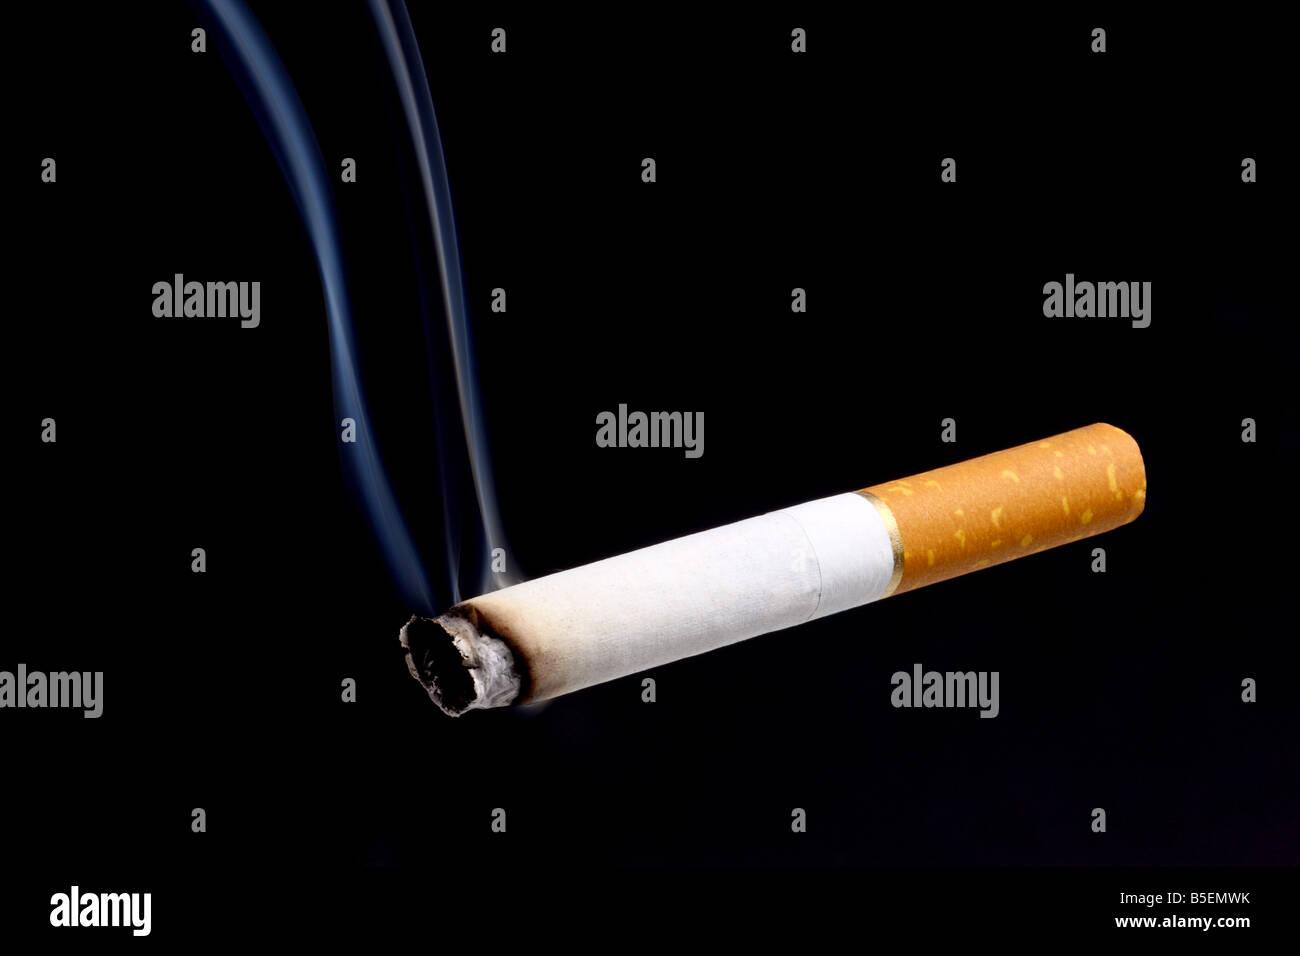 Cigarette on black background - Stock Image